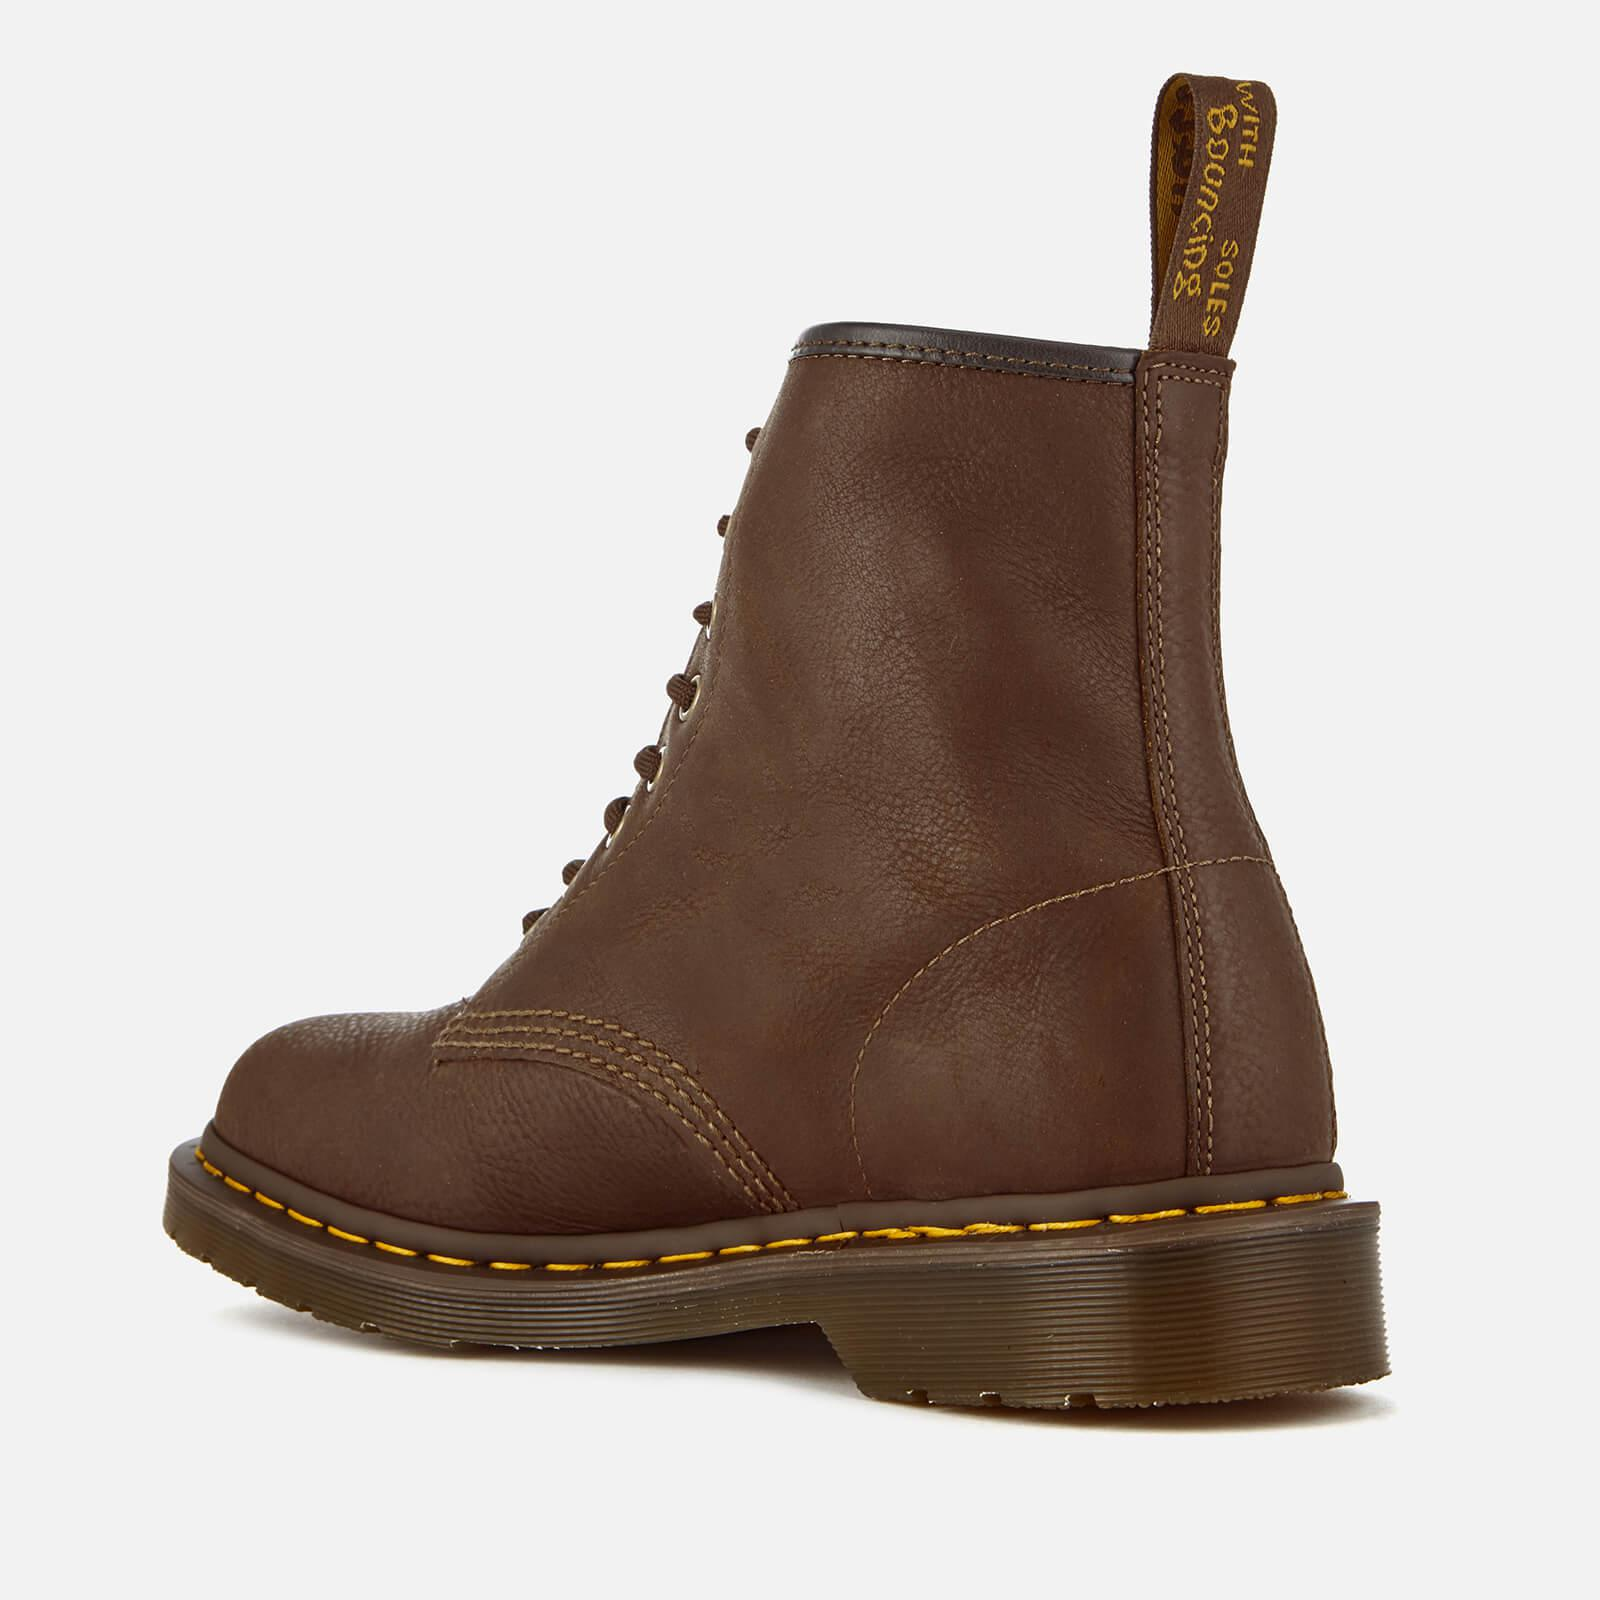 d1434b5c6aa Dr. Martens Brown 1460 Carpathian Full Grain Leather 8-eye Boots for men